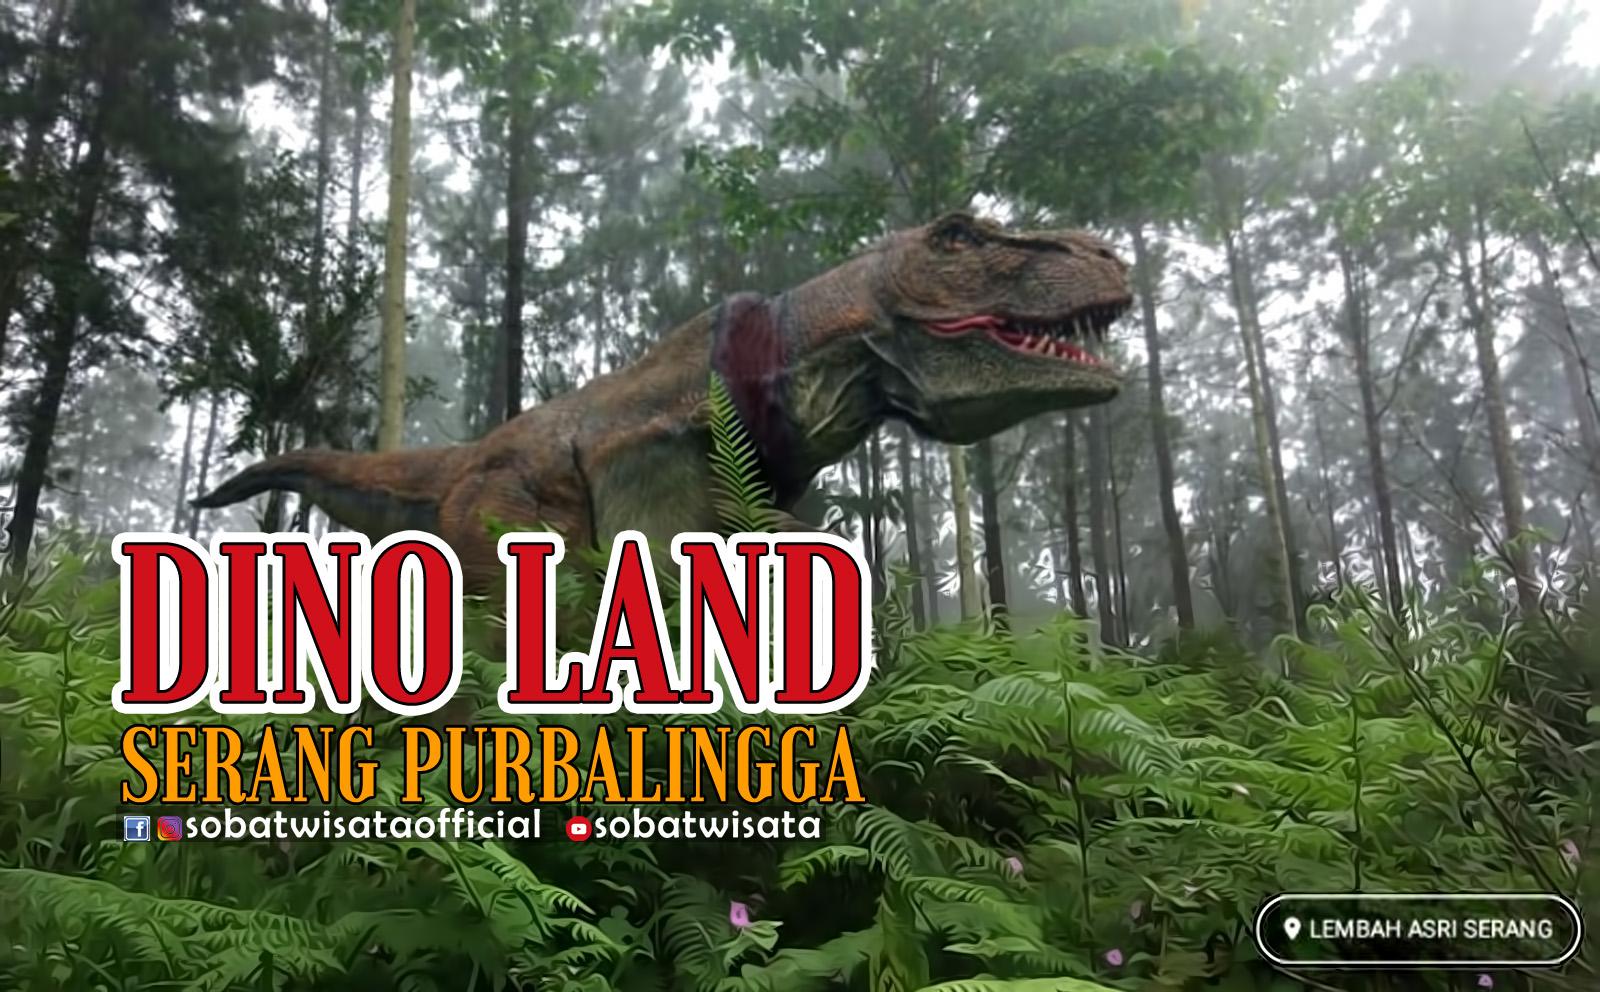 Taman Dinoland Serang Purbalingga